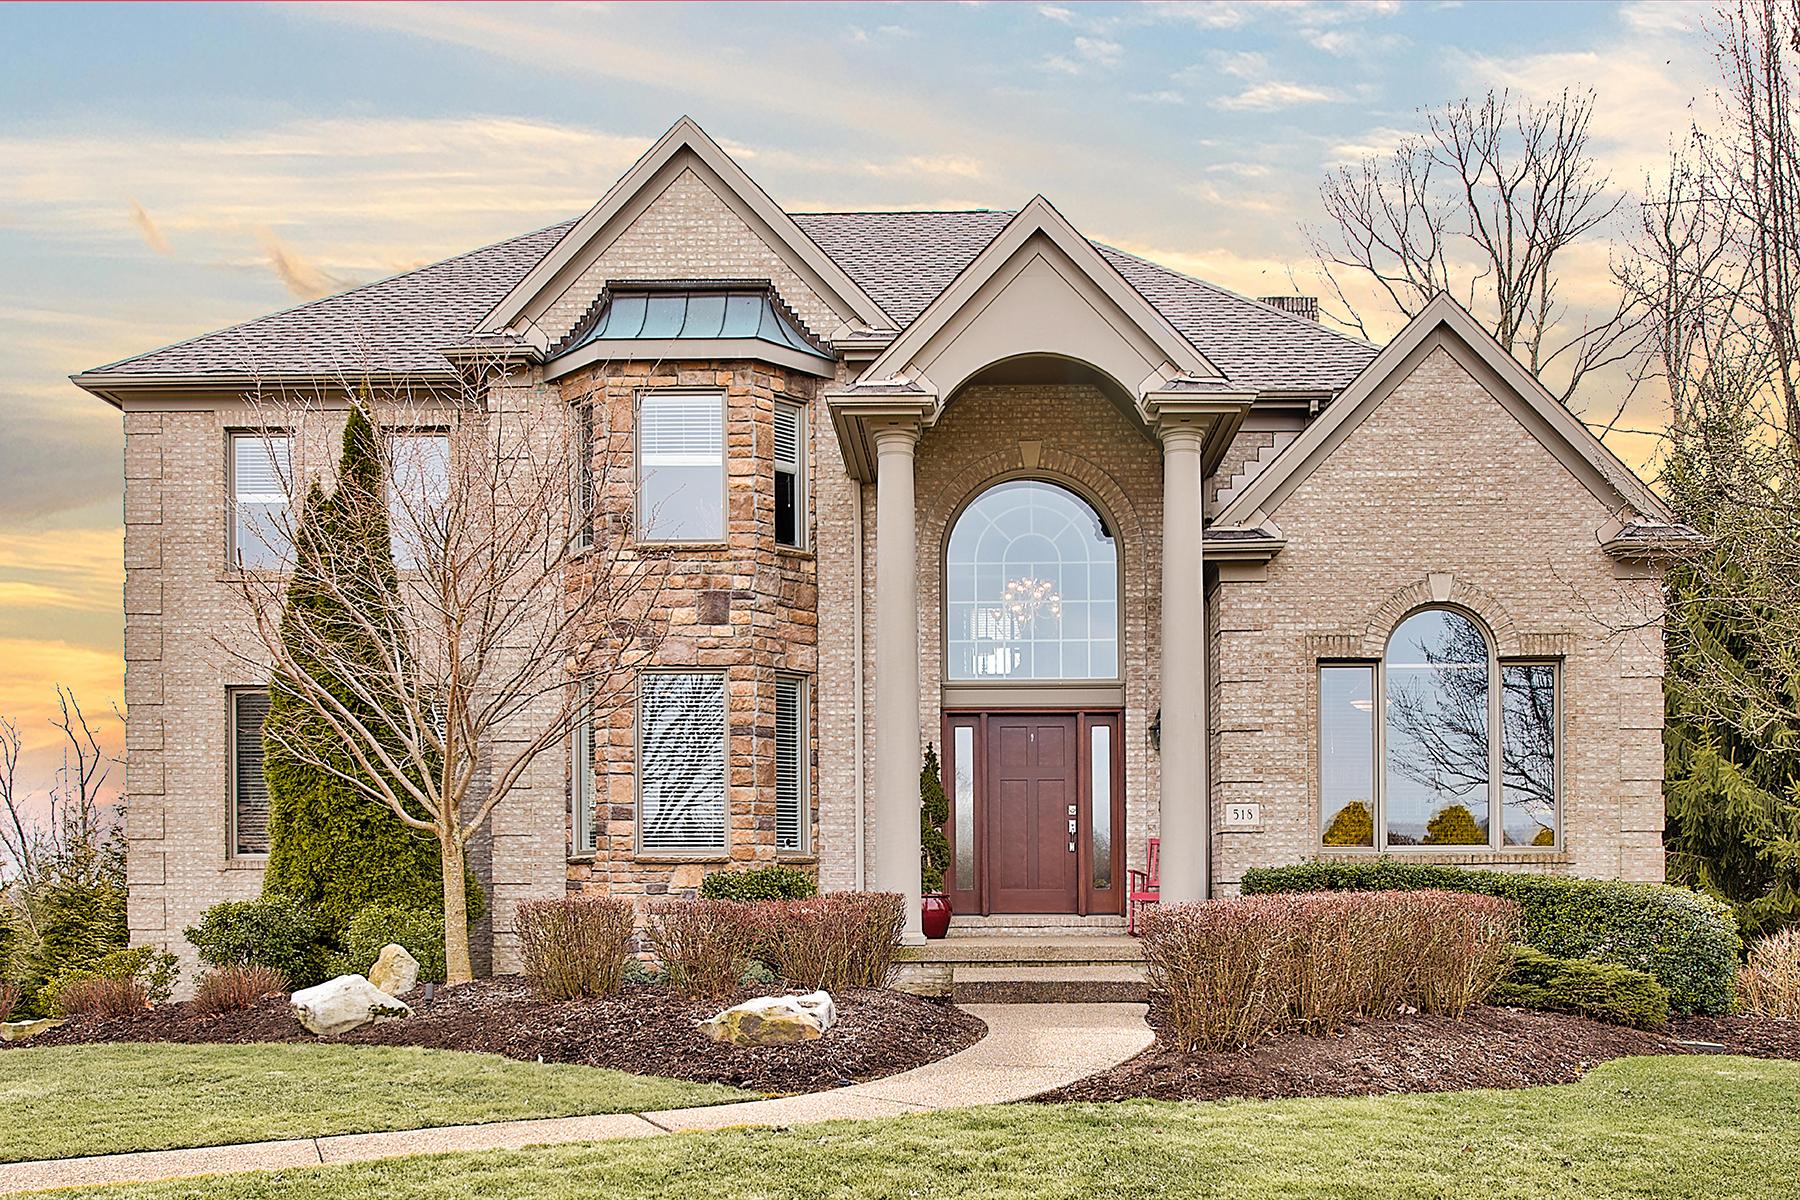 Single Family Homes για την Πώληση στο Custom Home in Golf Course Community! 518 Laurel Oak Drive, Sewickley, Πενσιλβανια 15143 Ηνωμένες Πολιτείες